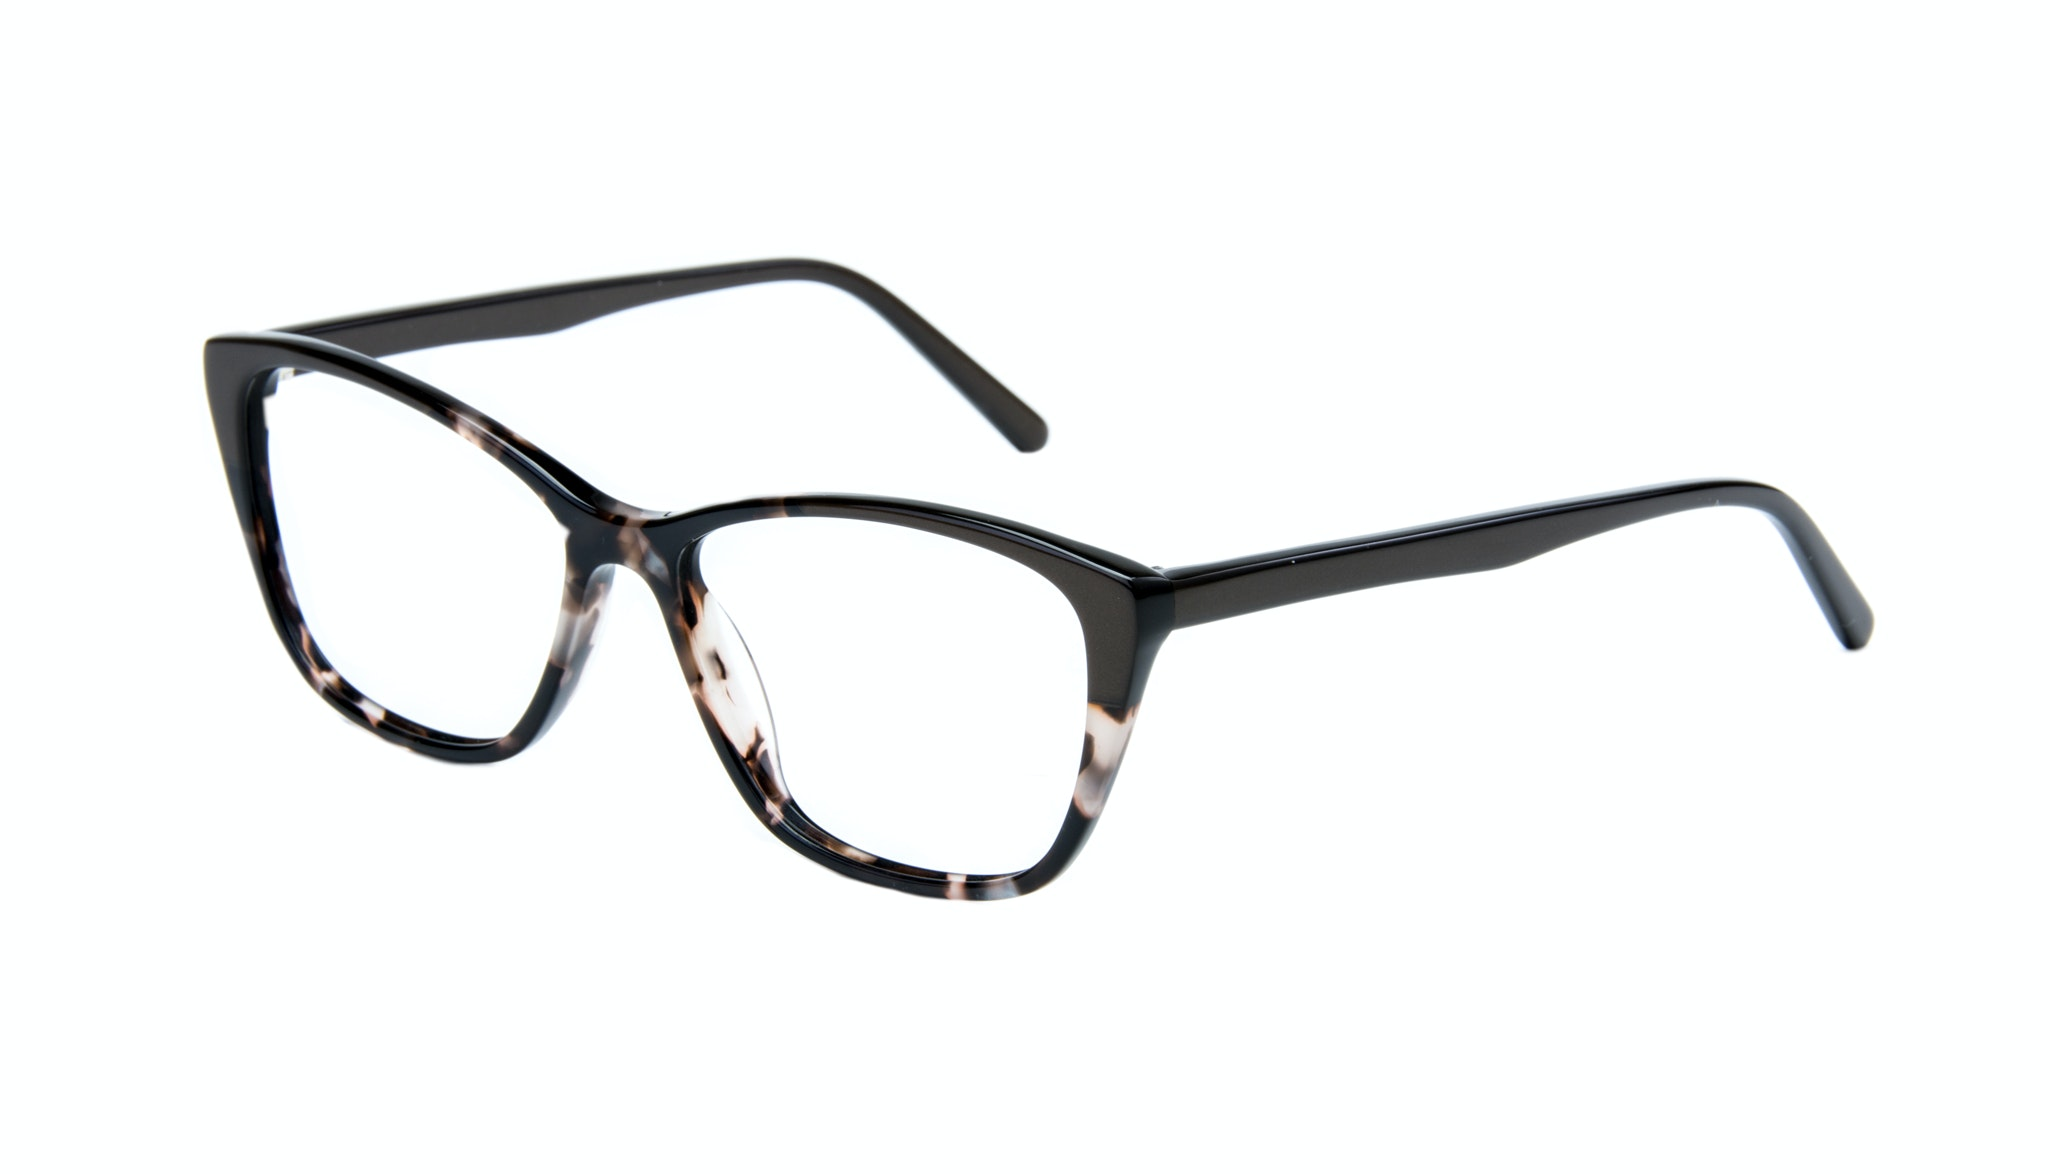 Affordable Fashion Glasses Cat Eye Rectangle Eyeglasses Women Myrtle Grey Stone Tilt